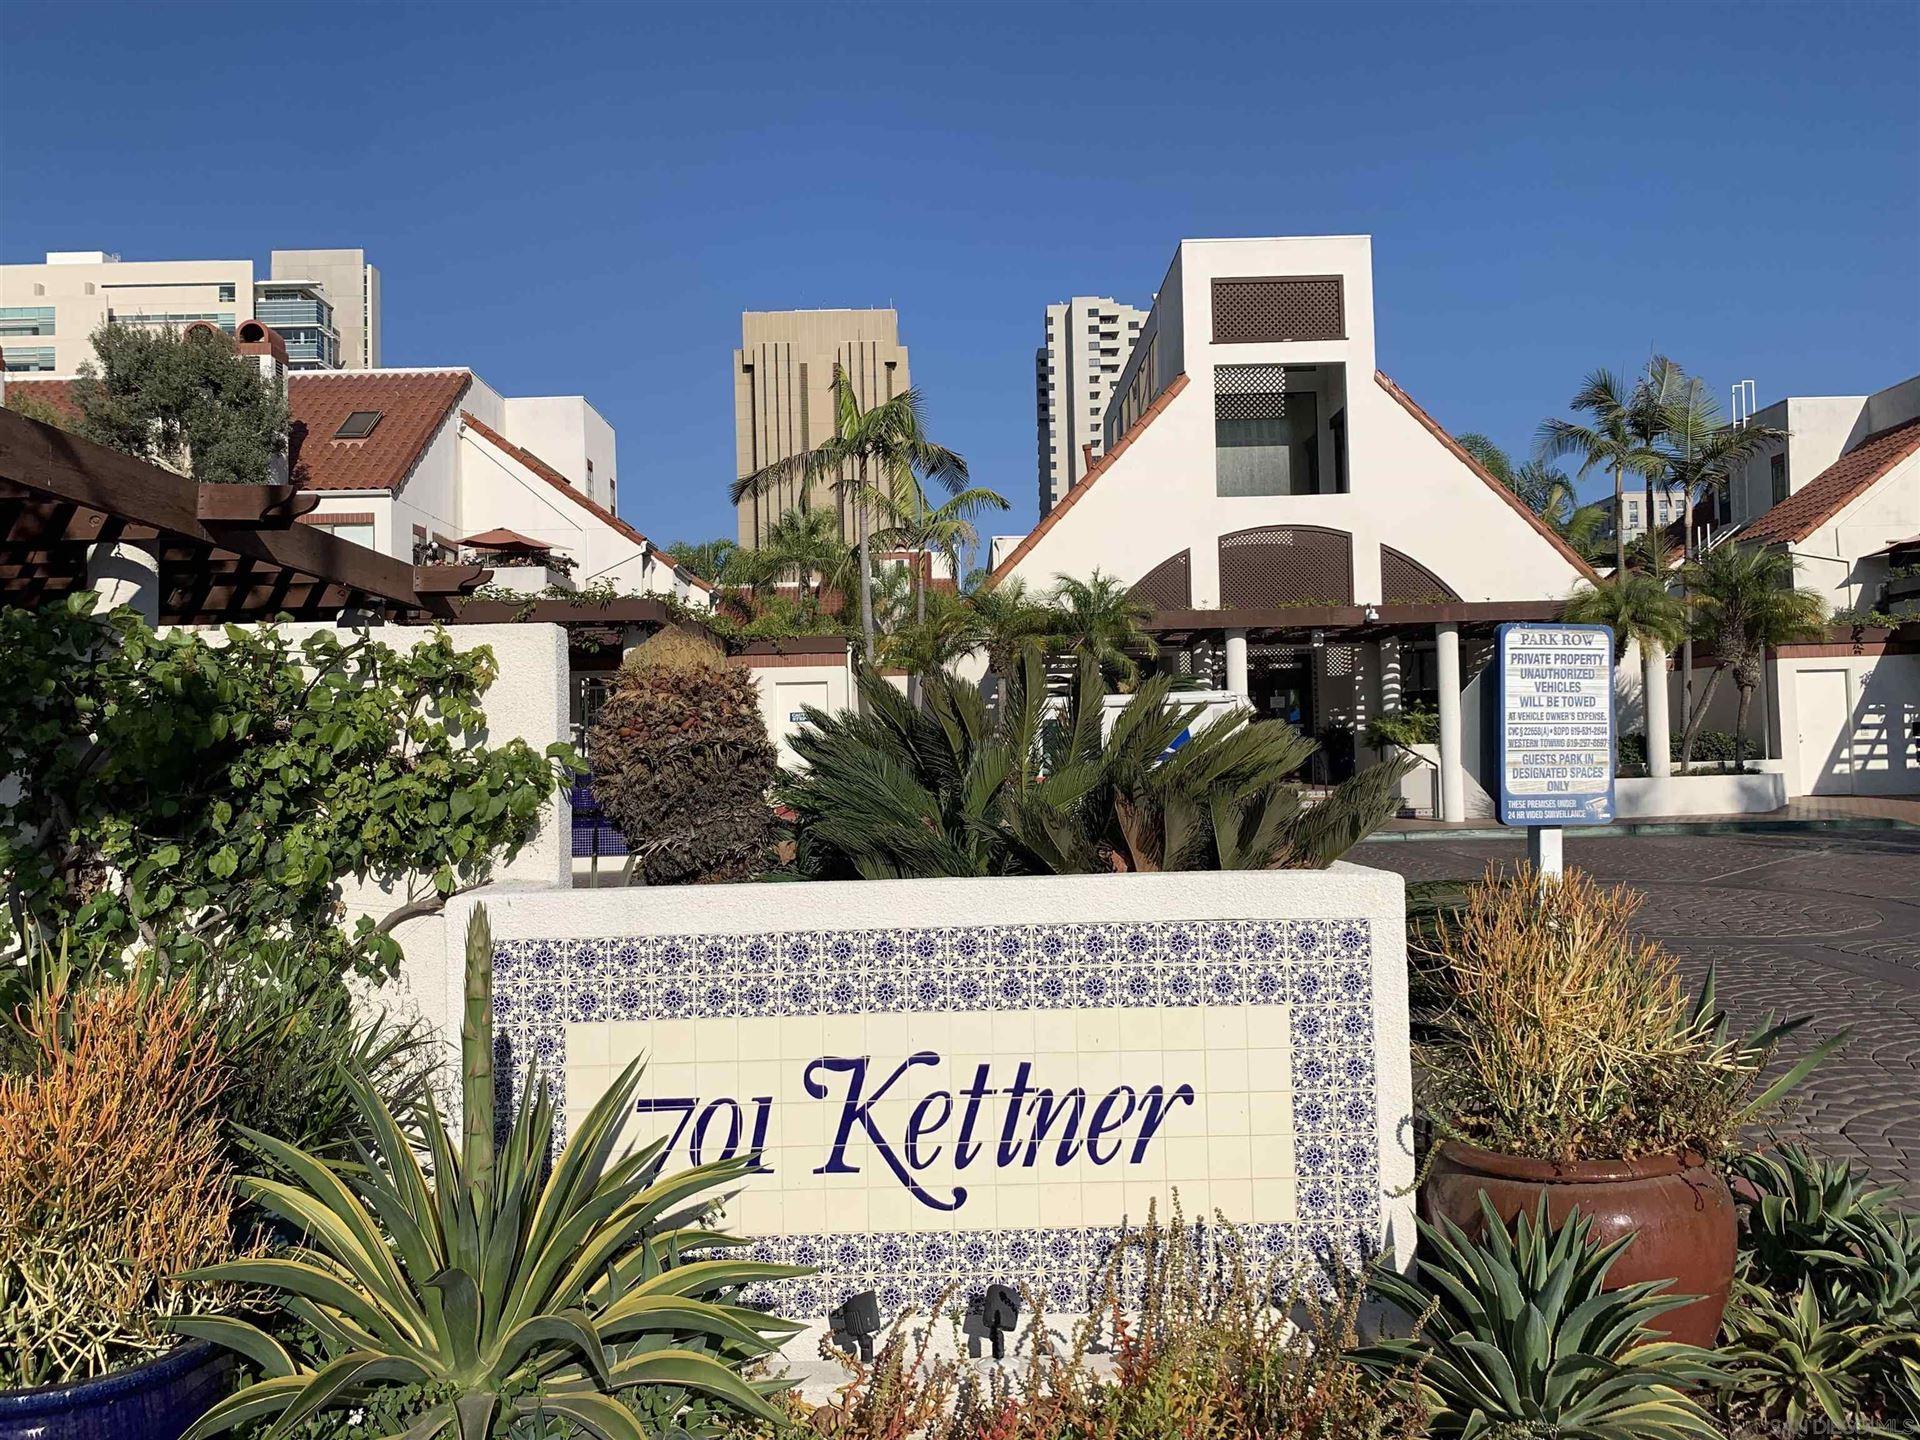 Photo of 701 Kettner Blvd #89, San Diego, CA 92101 (MLS # 210026566)